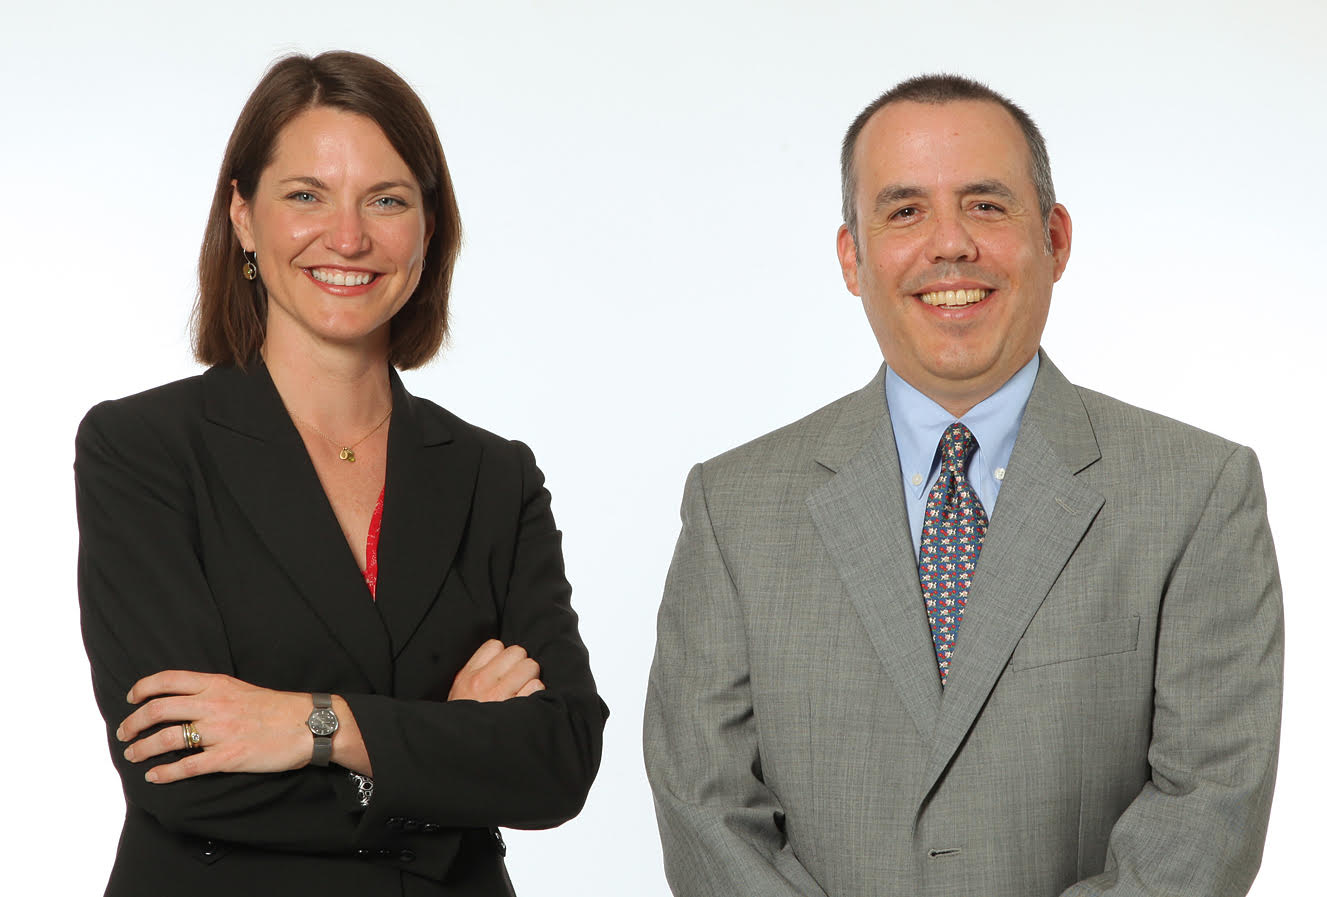 Elizabeth A. Fritzinger and David Berry at Berry & Fritzinger, P.C. in Santa Rosa, CA.